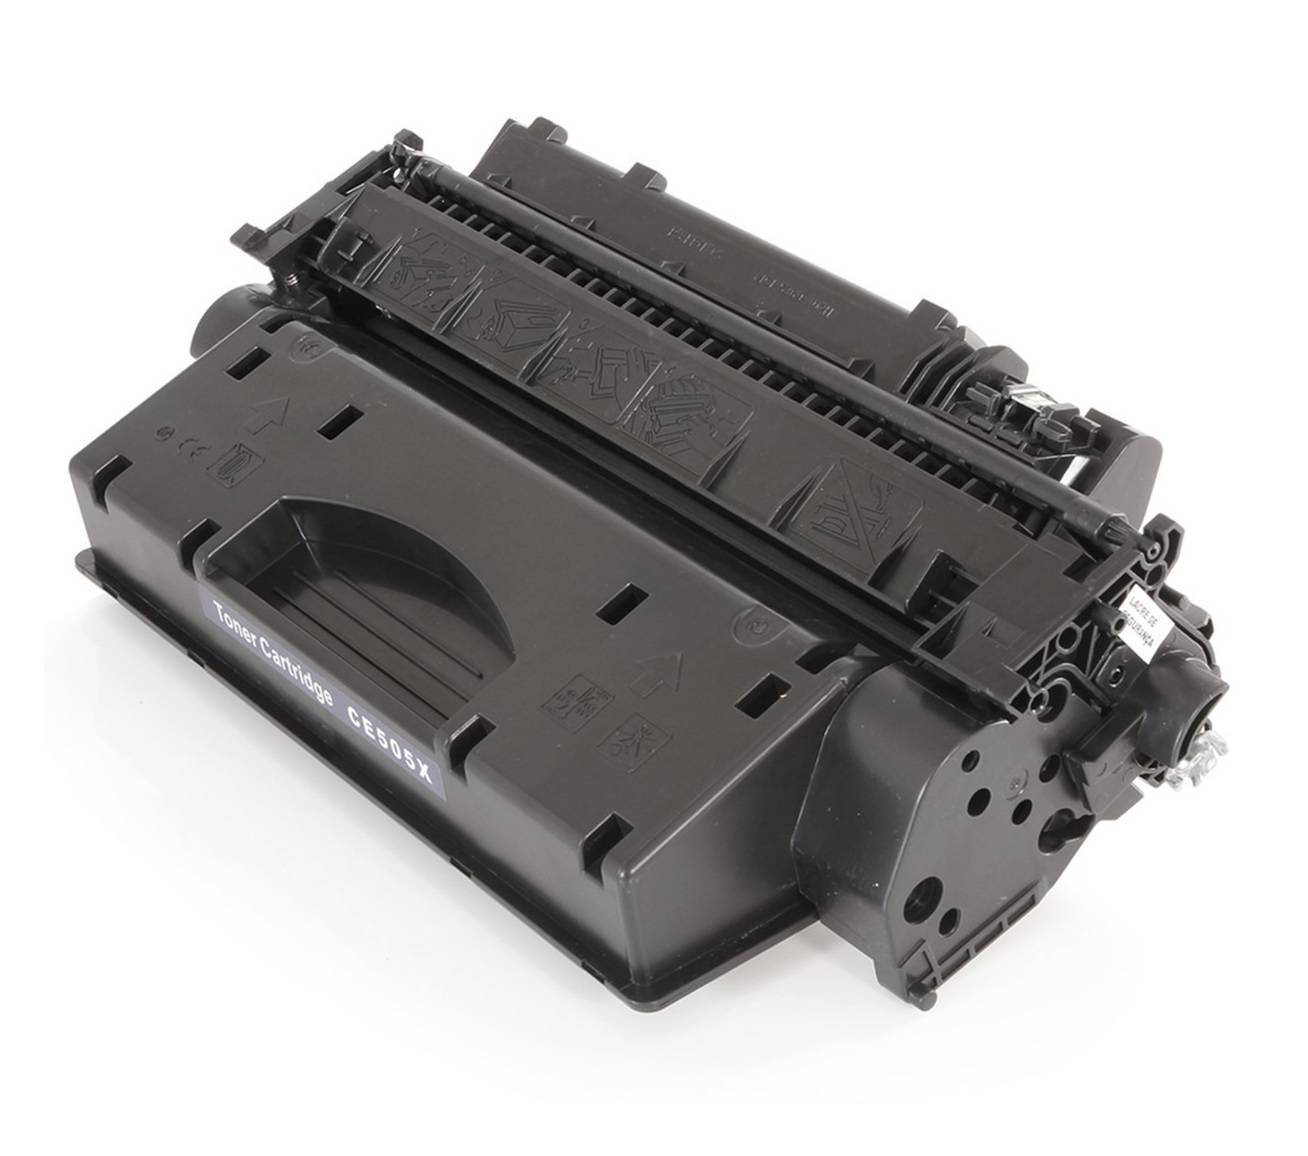 CARTUCHO DE TONER PRETO PARA HP LJ P2055 / CE505X KATUN SELECT 6.9K - PRINTER DO BRASIL